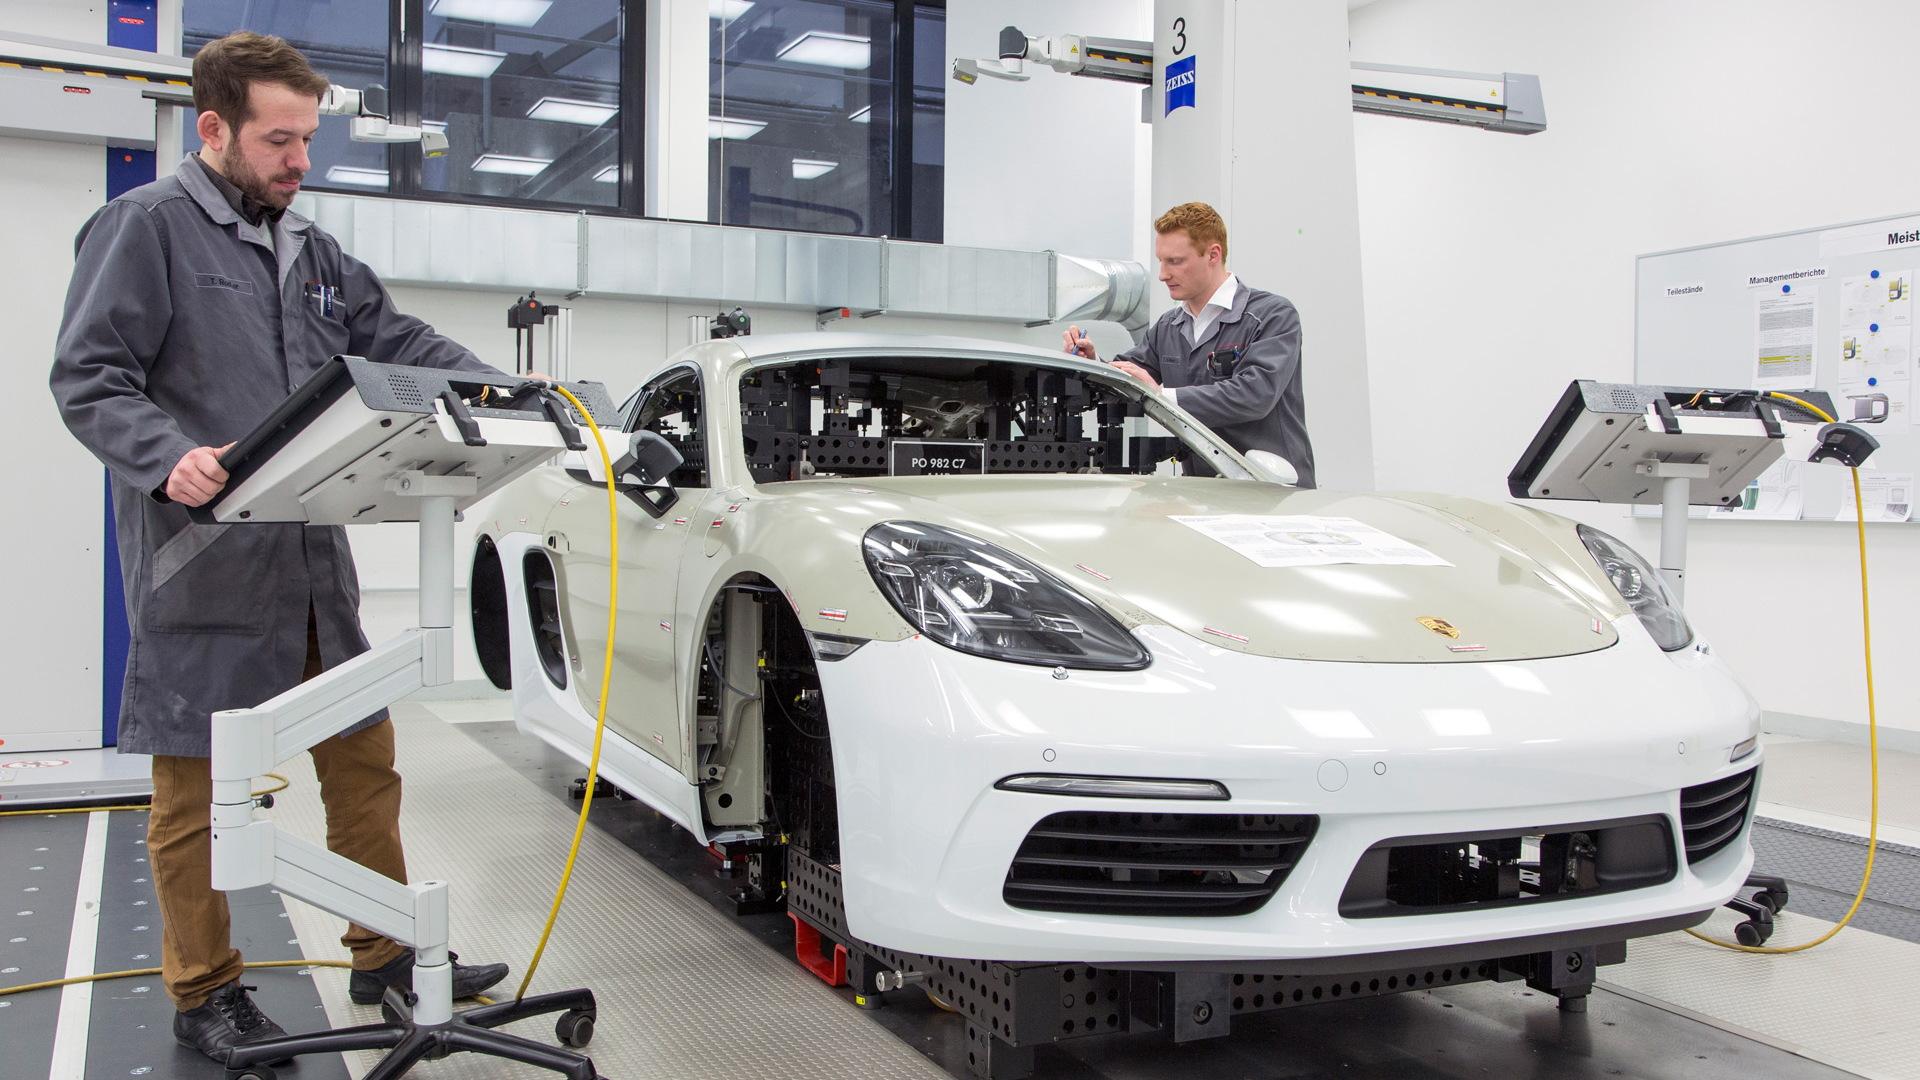 Quality control at Porsche